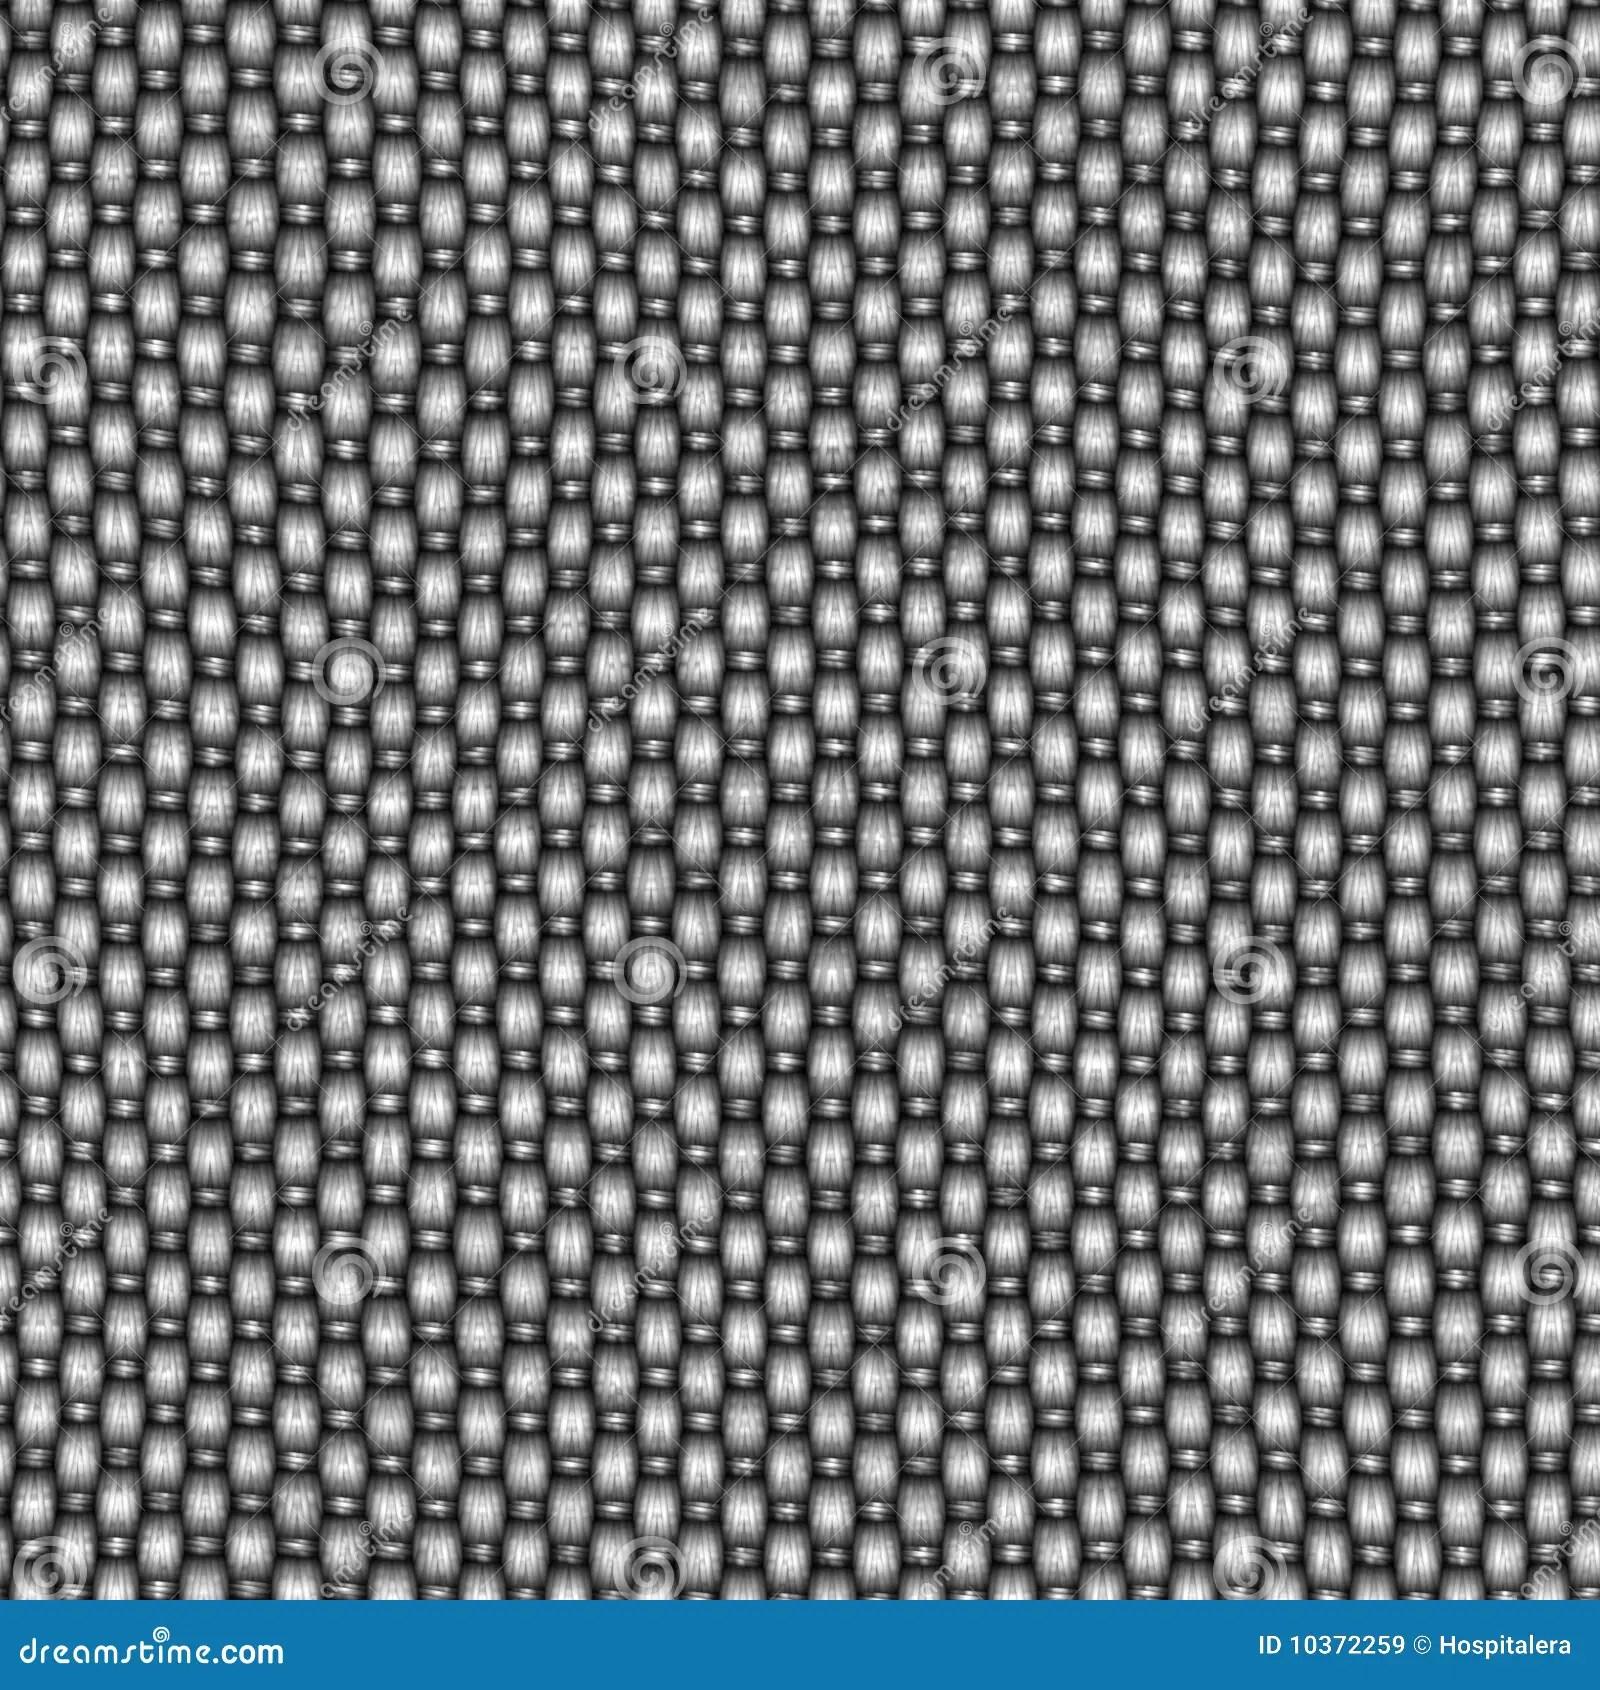 Plain Black Wallpaper Double Weave Carbon Fiber Stock Illustration Image Of